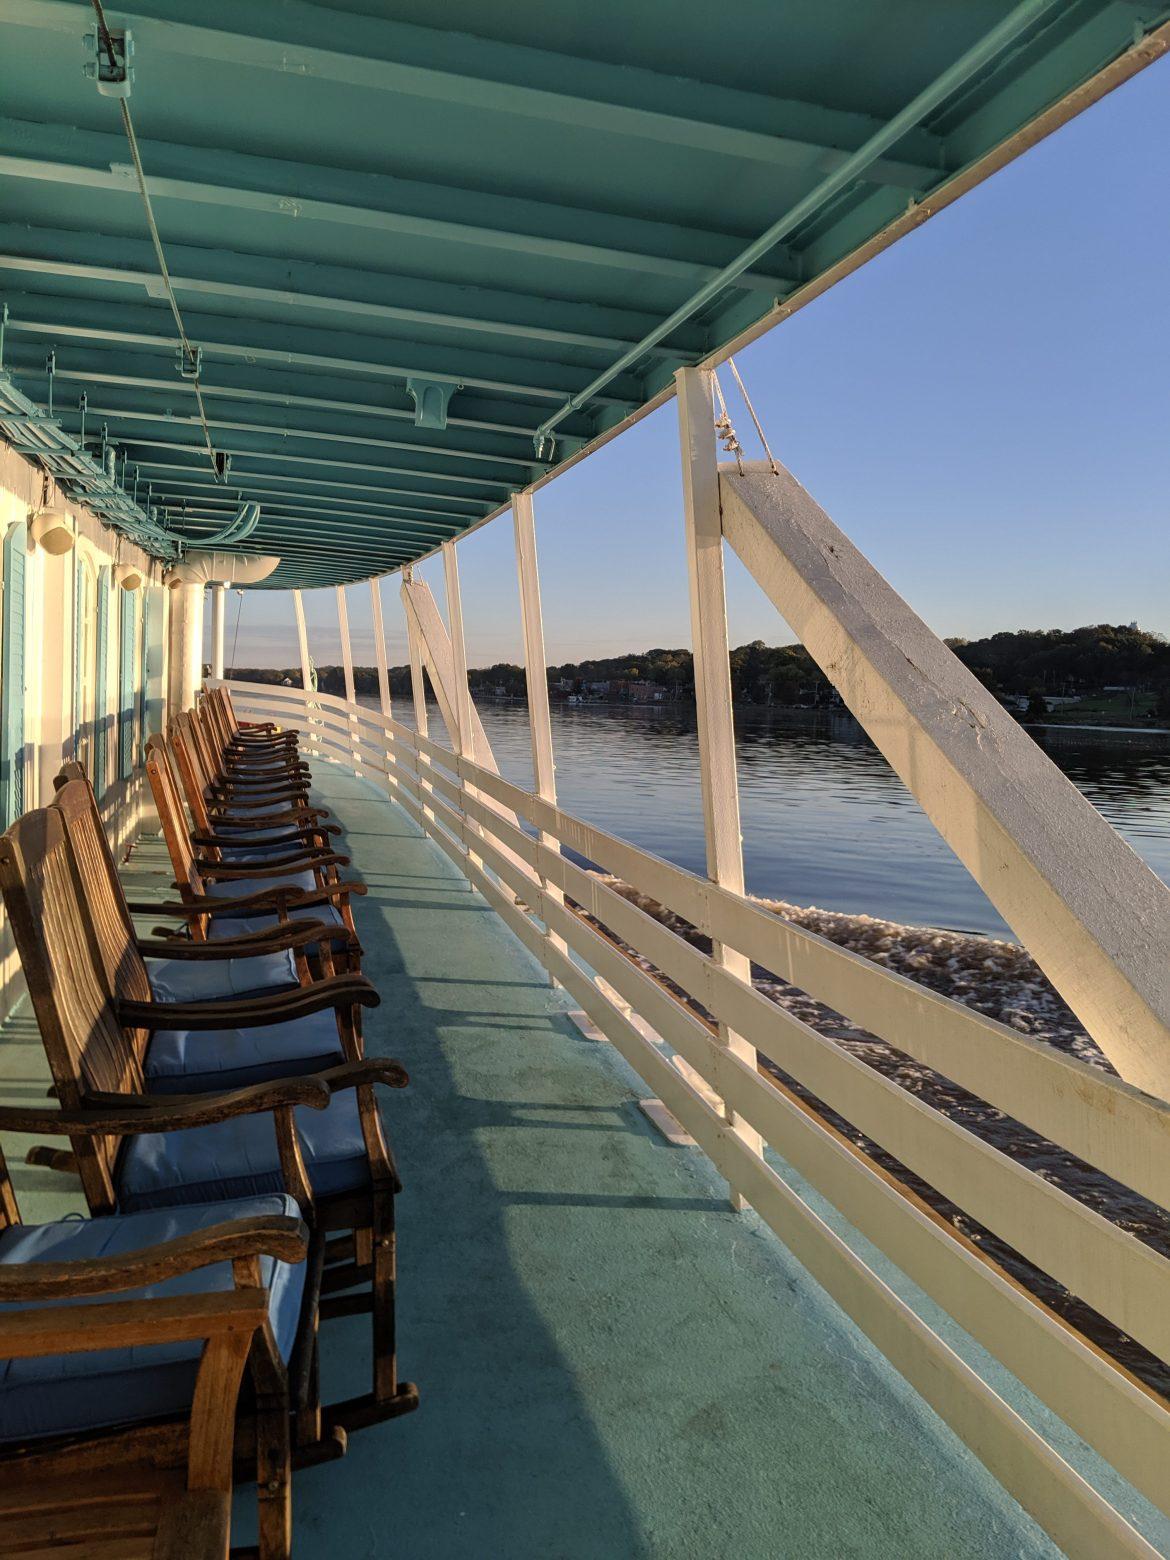 Riverboat CruiseIMG_20191017_075406